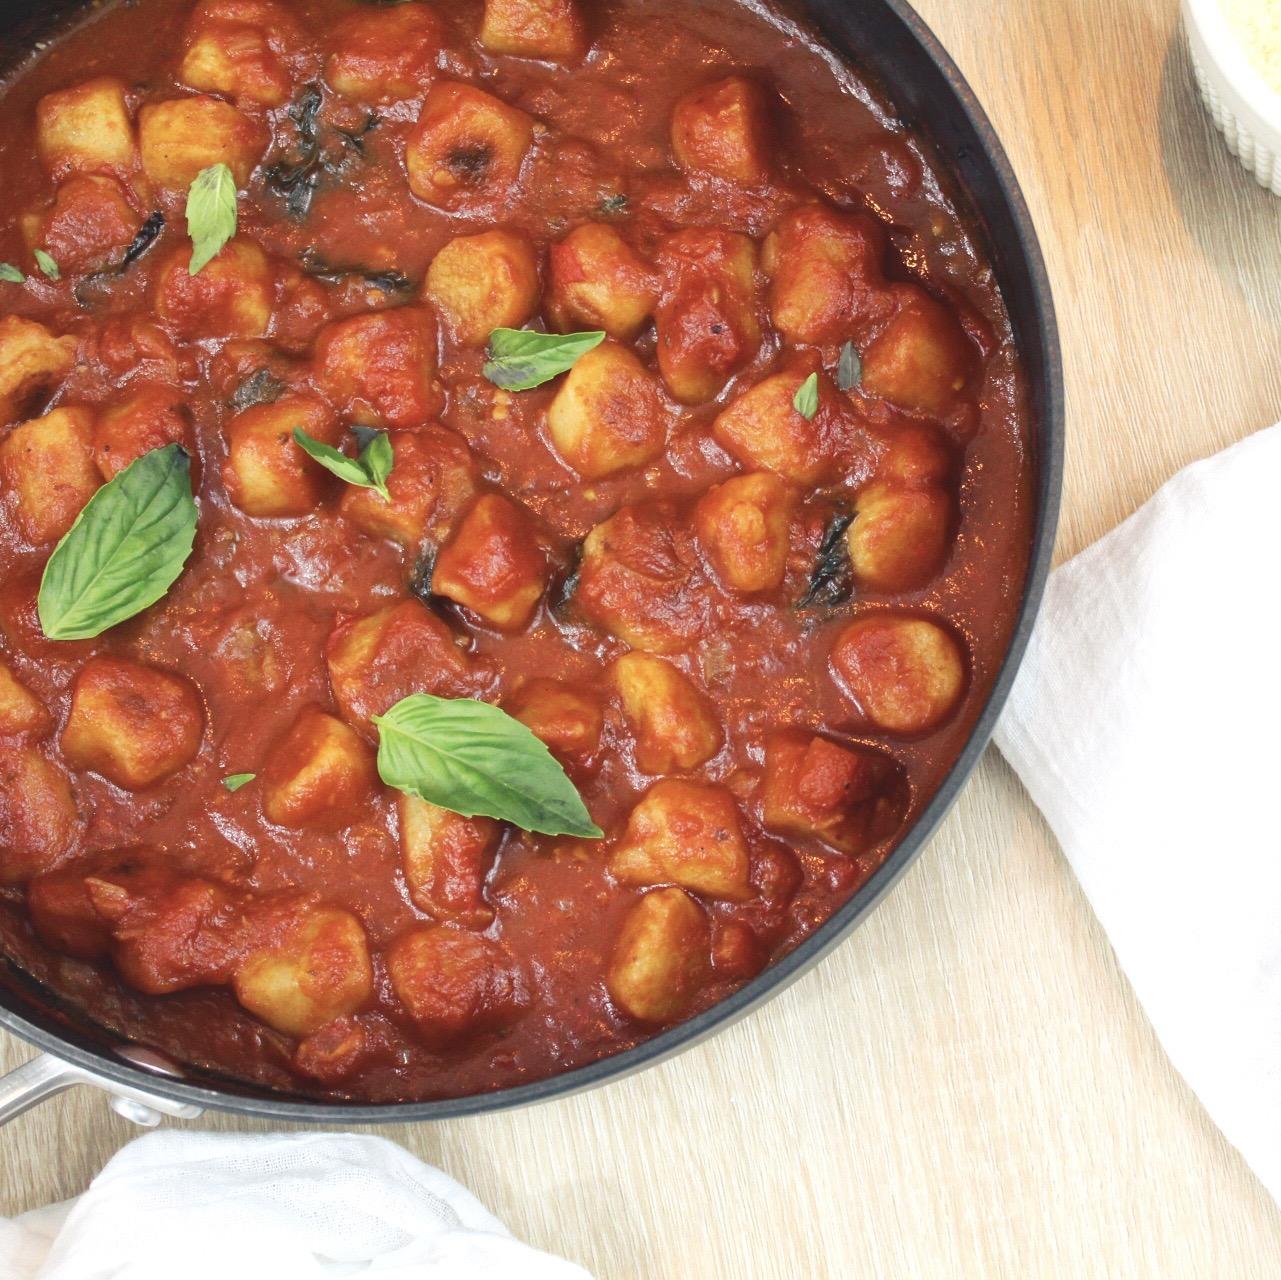 Cauliflower Gnocchi with Marinara Sauce